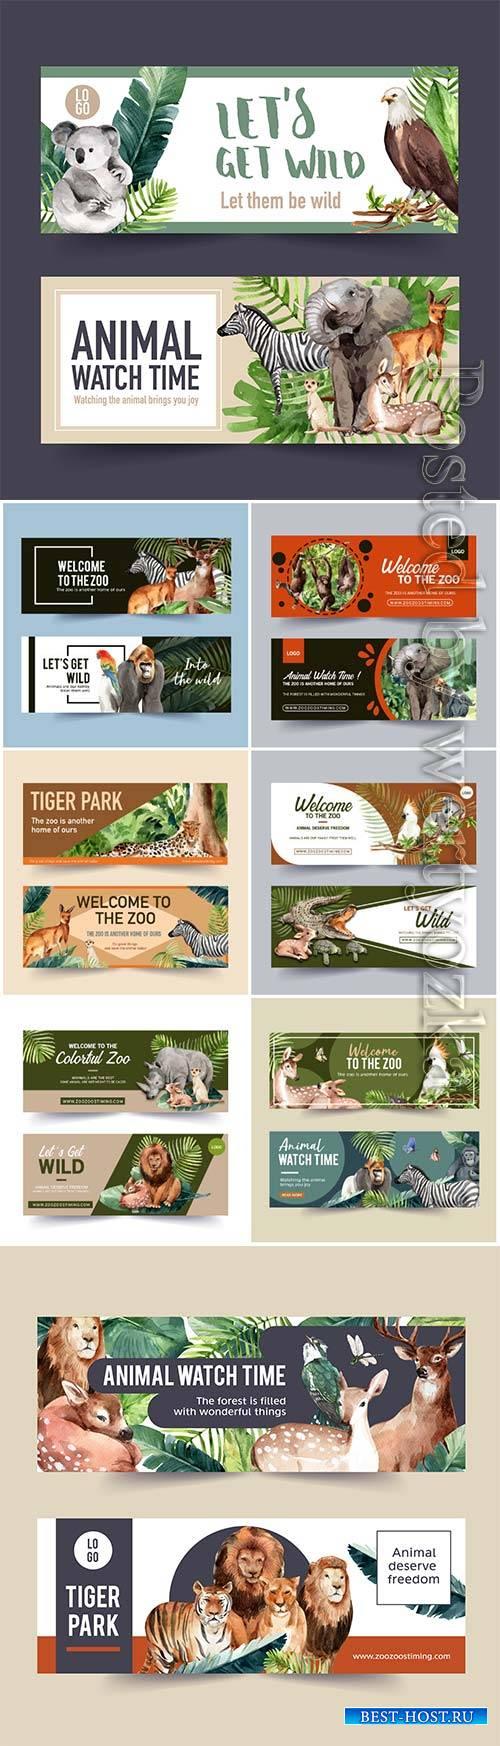 Zoo banner design with tiger, lion, deer watercolor illustration